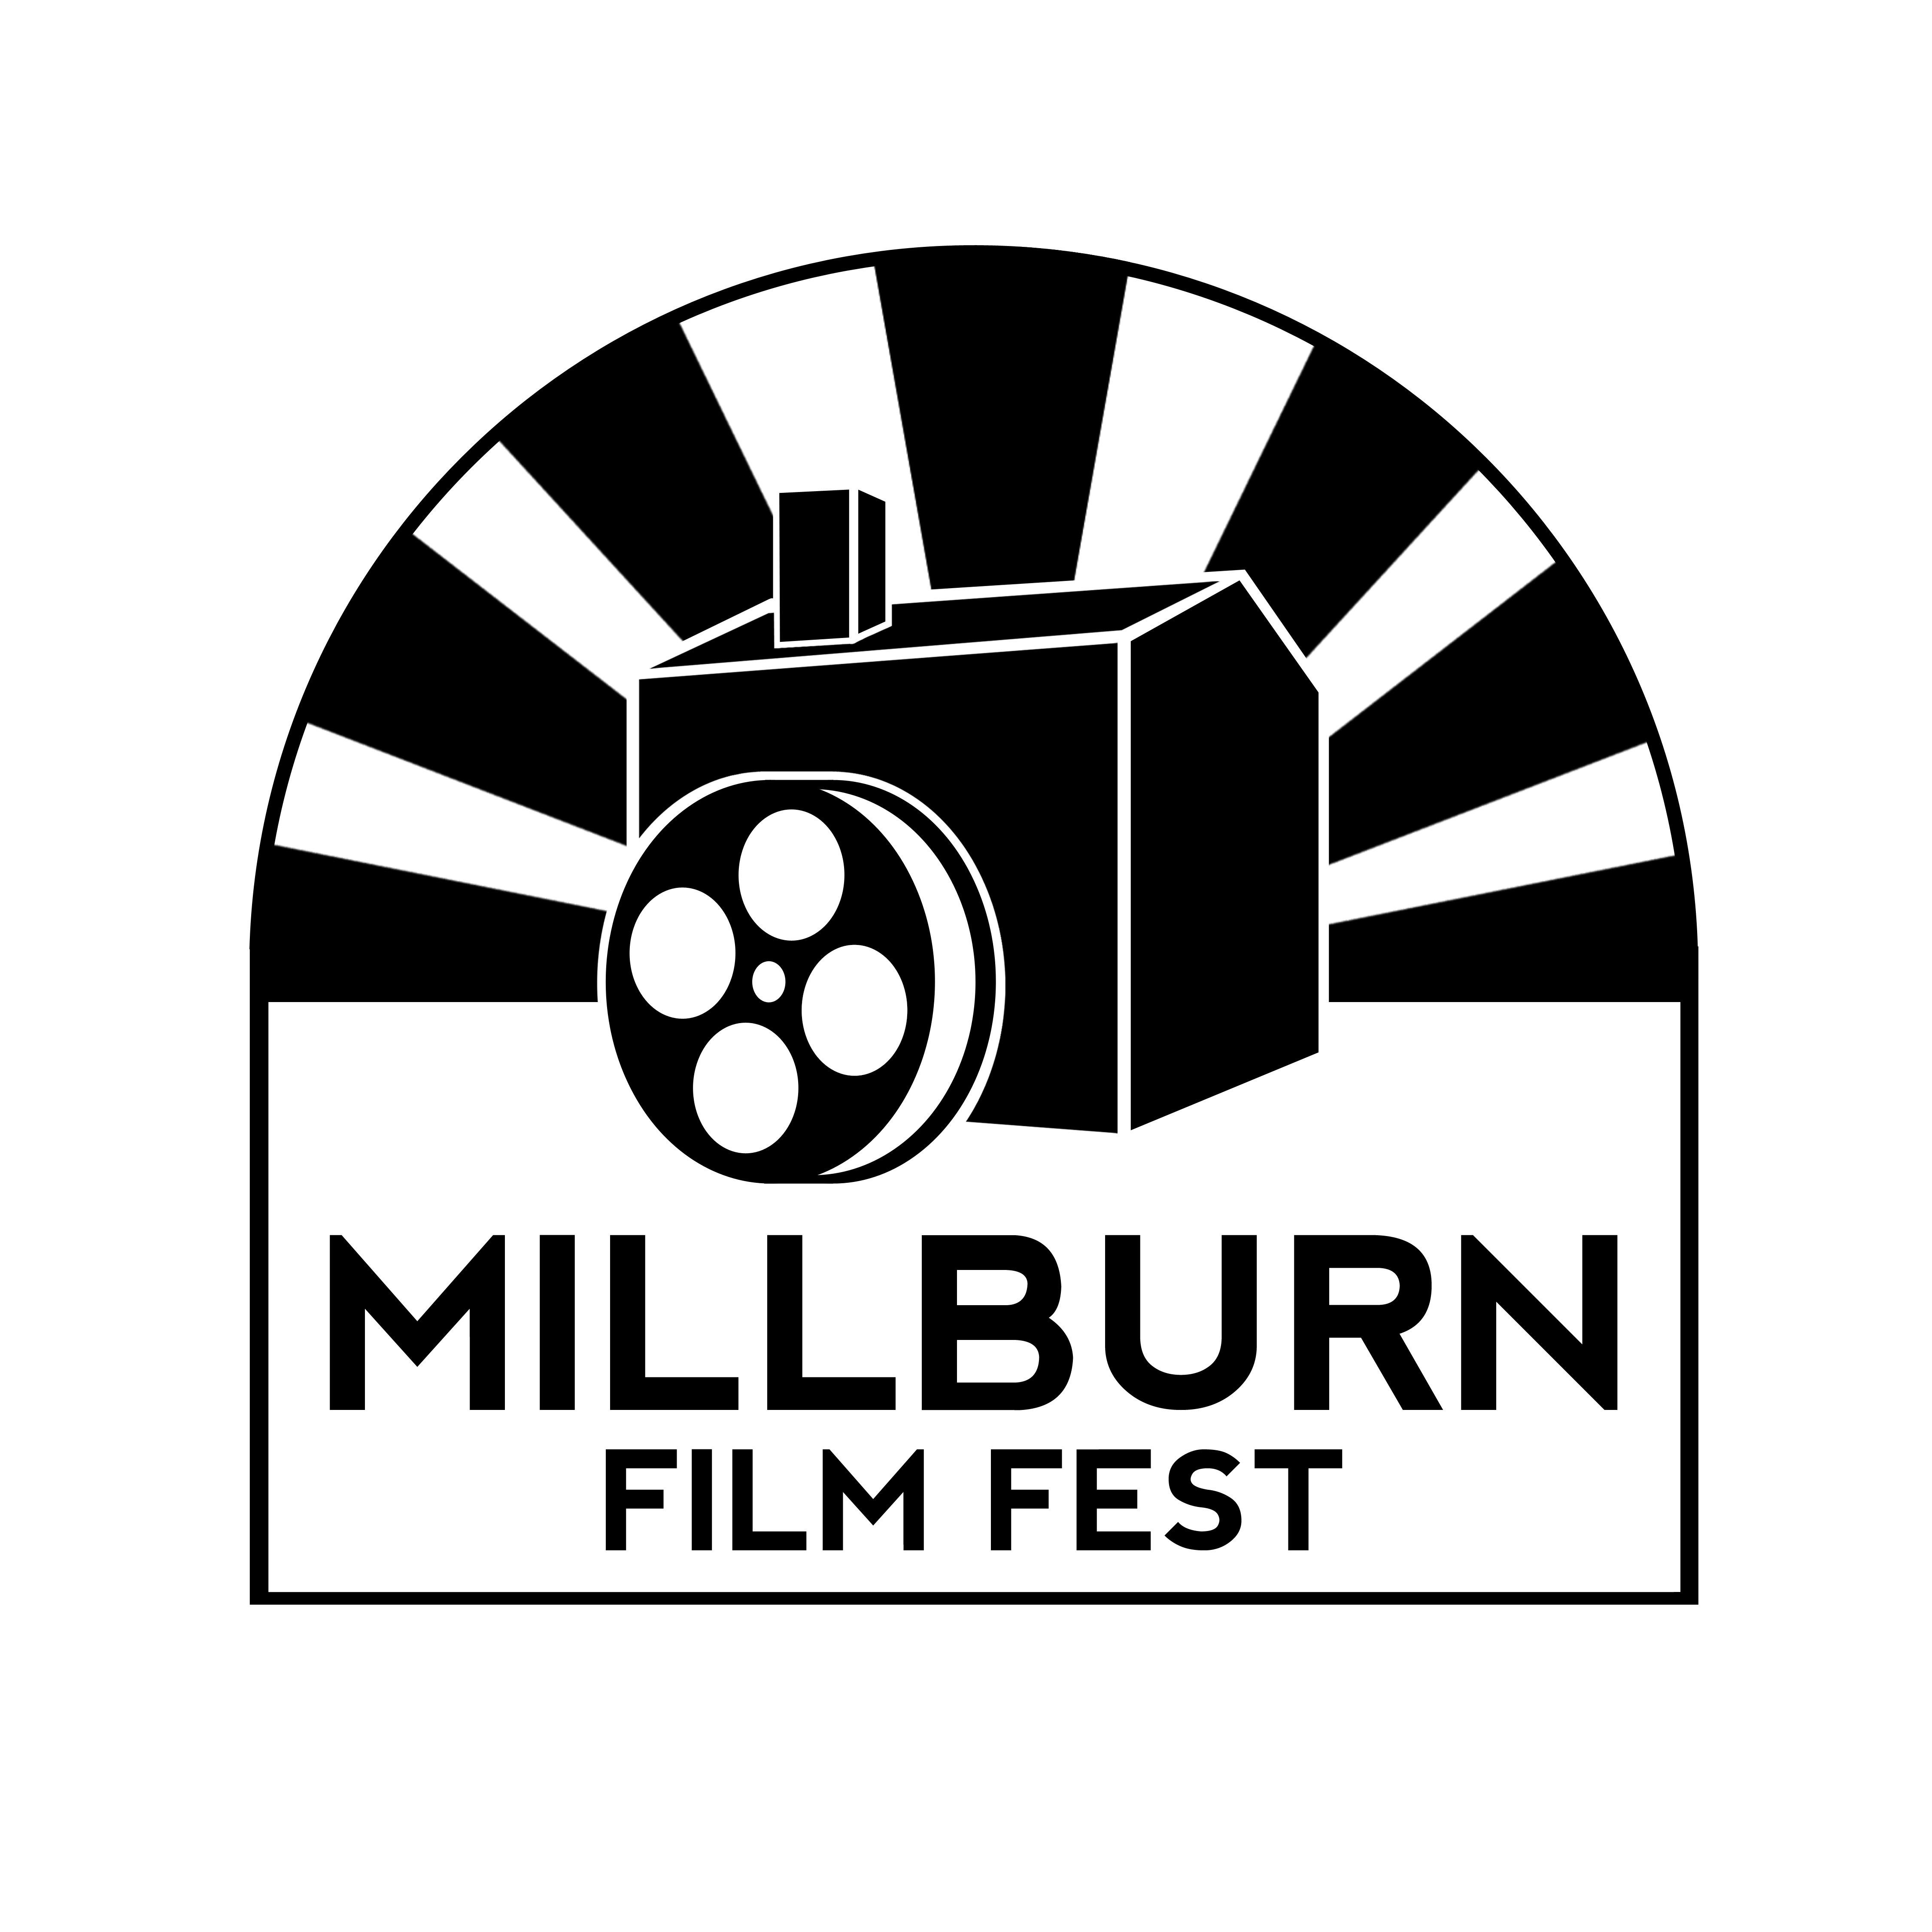 Eight Winning Films to be Shown at the Millburn Film Fest